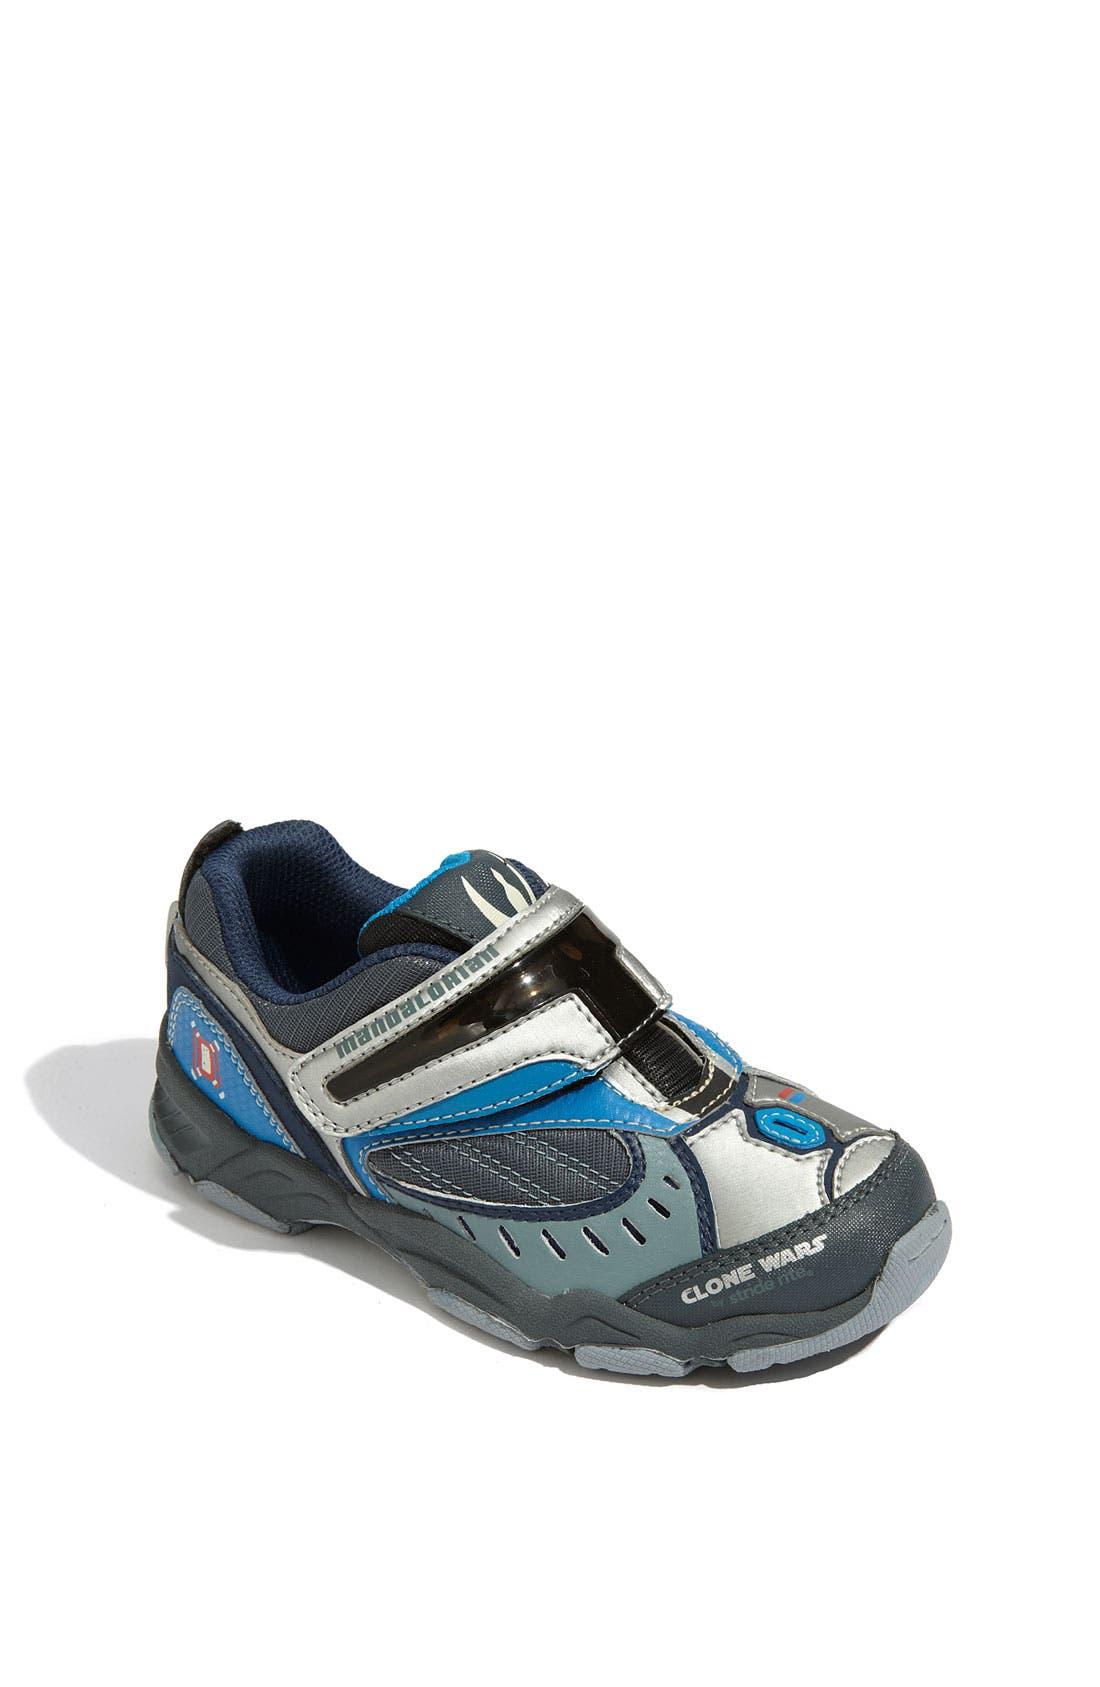 'Star Wars<sup>™</sup> - Pre Vizsla' Lighted Sneaker, Main, color, 089